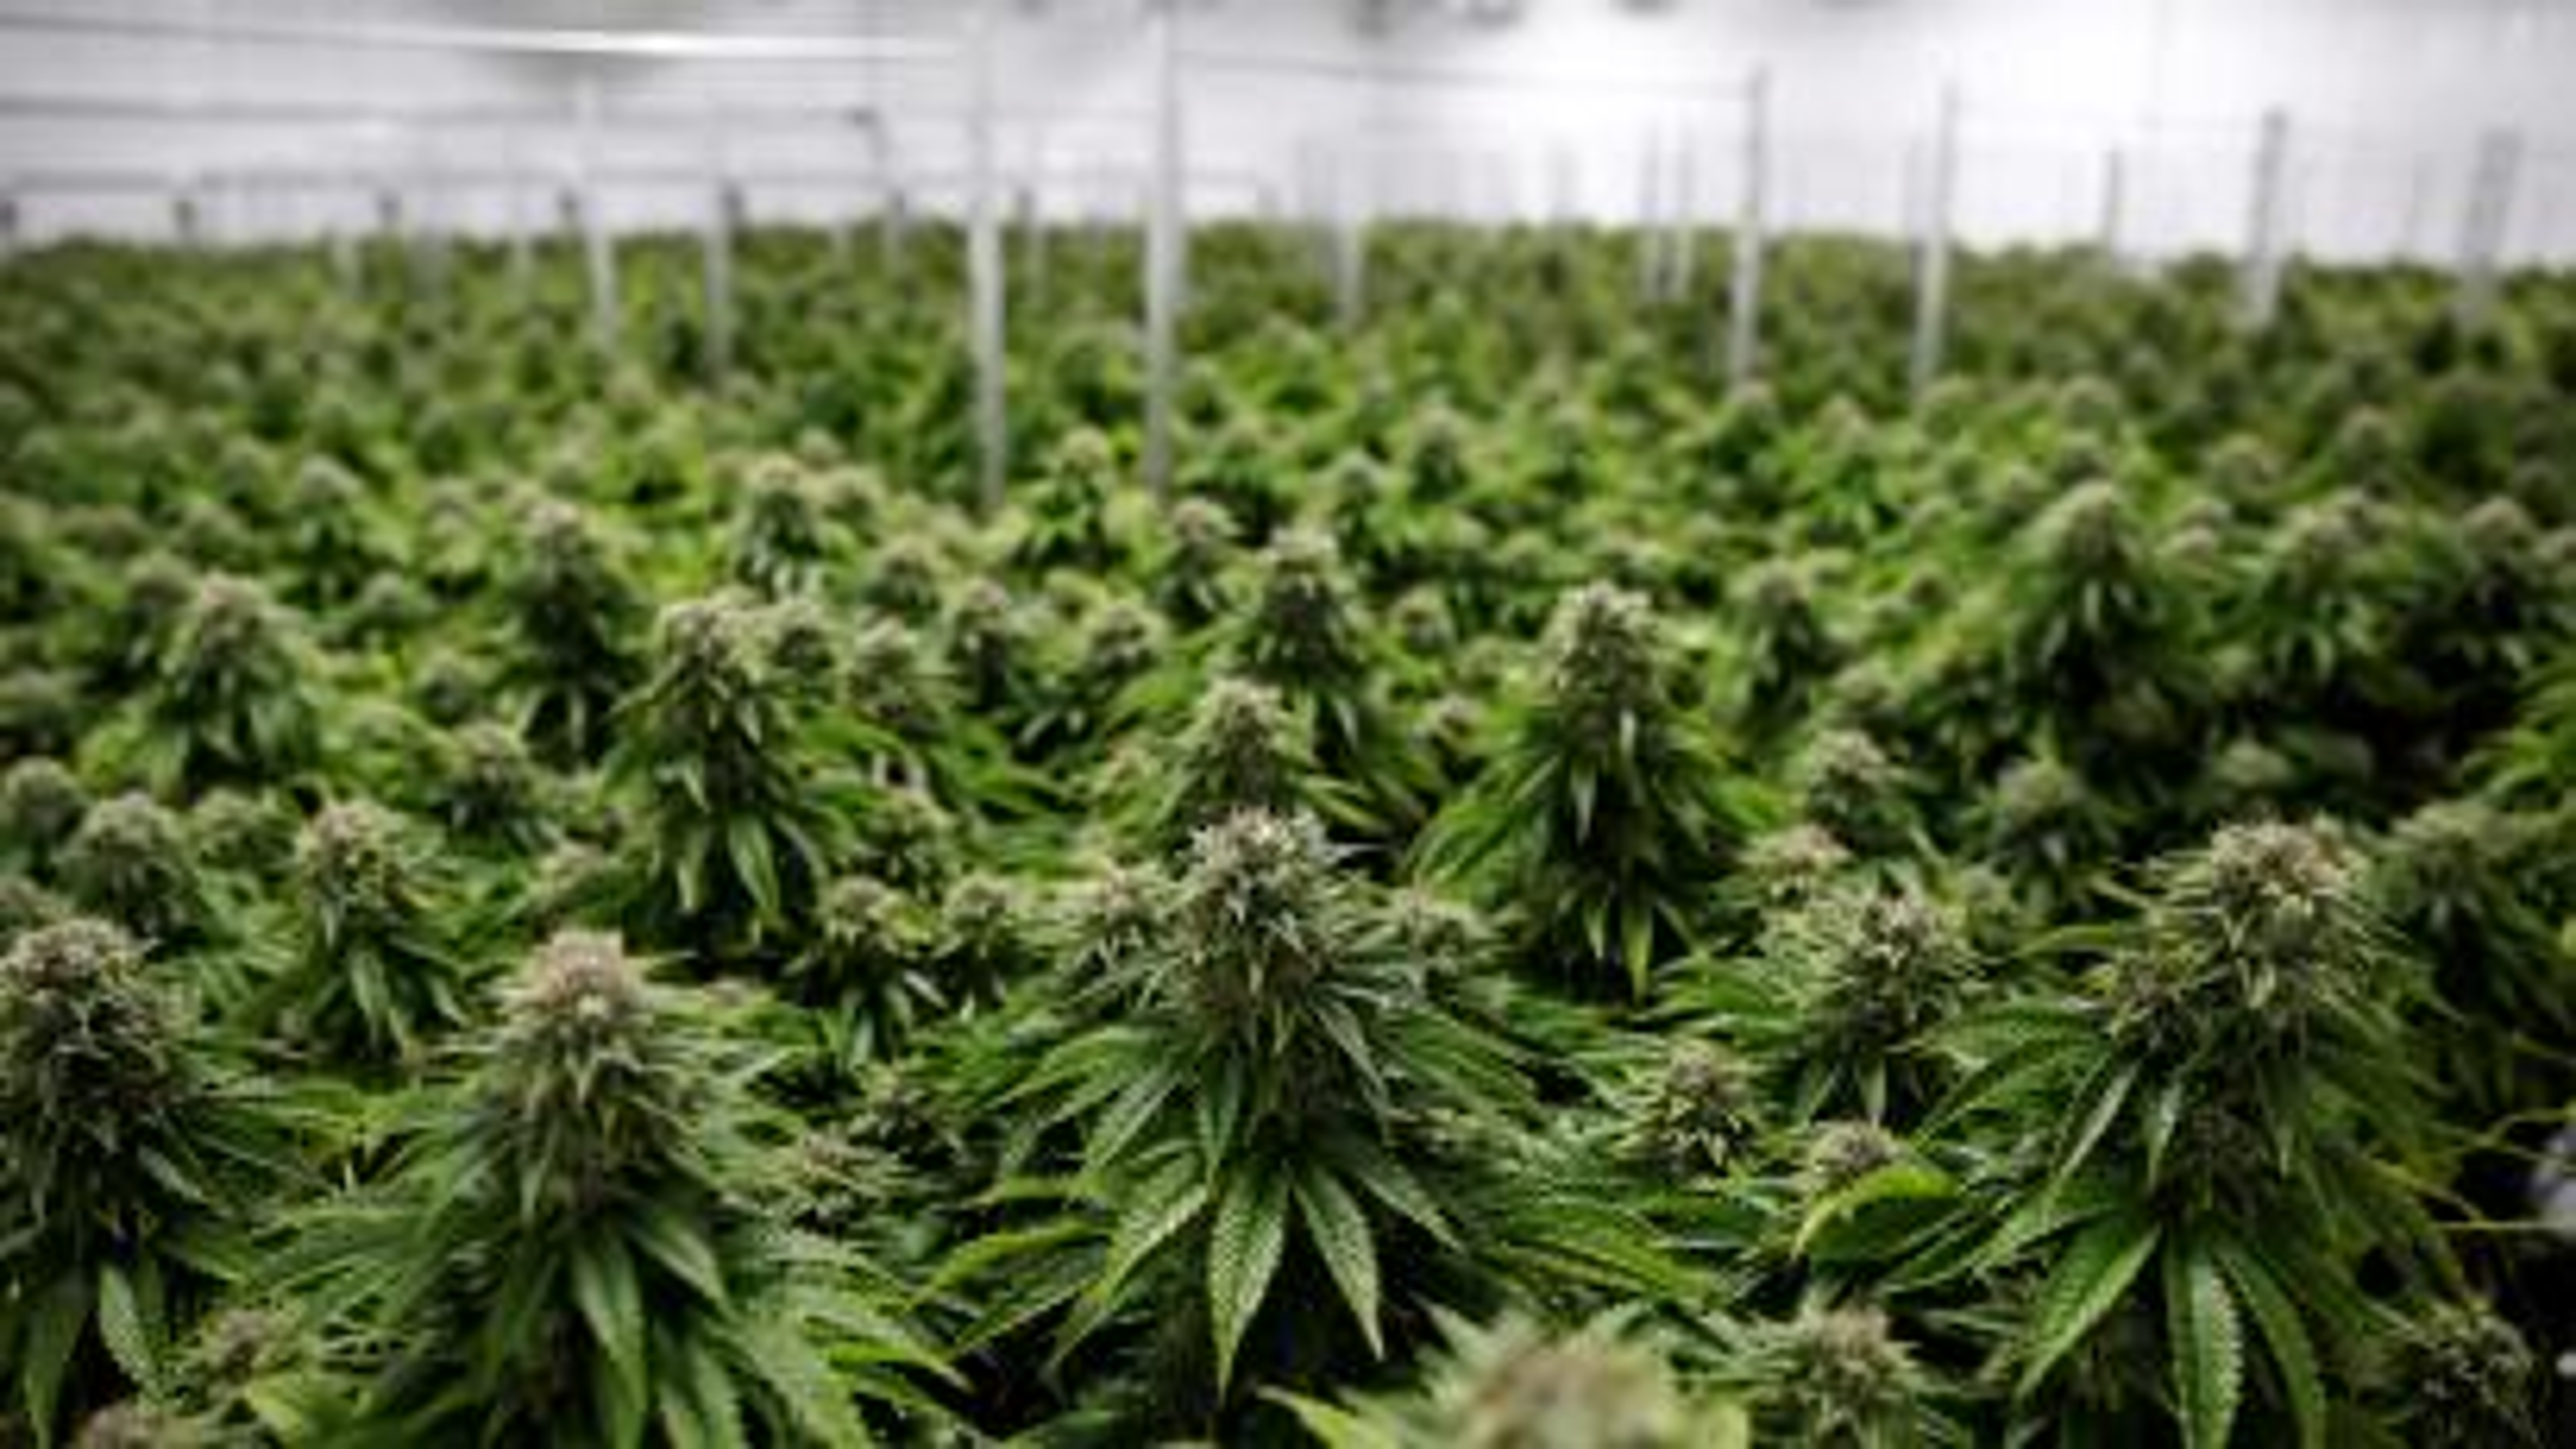 FILE PHOTO: Chemdawg marijuana plants grow at a facility in Smiths Falls, Ontario, Canada October 29, 2019. REUTERS/Blair Gable/File Photo